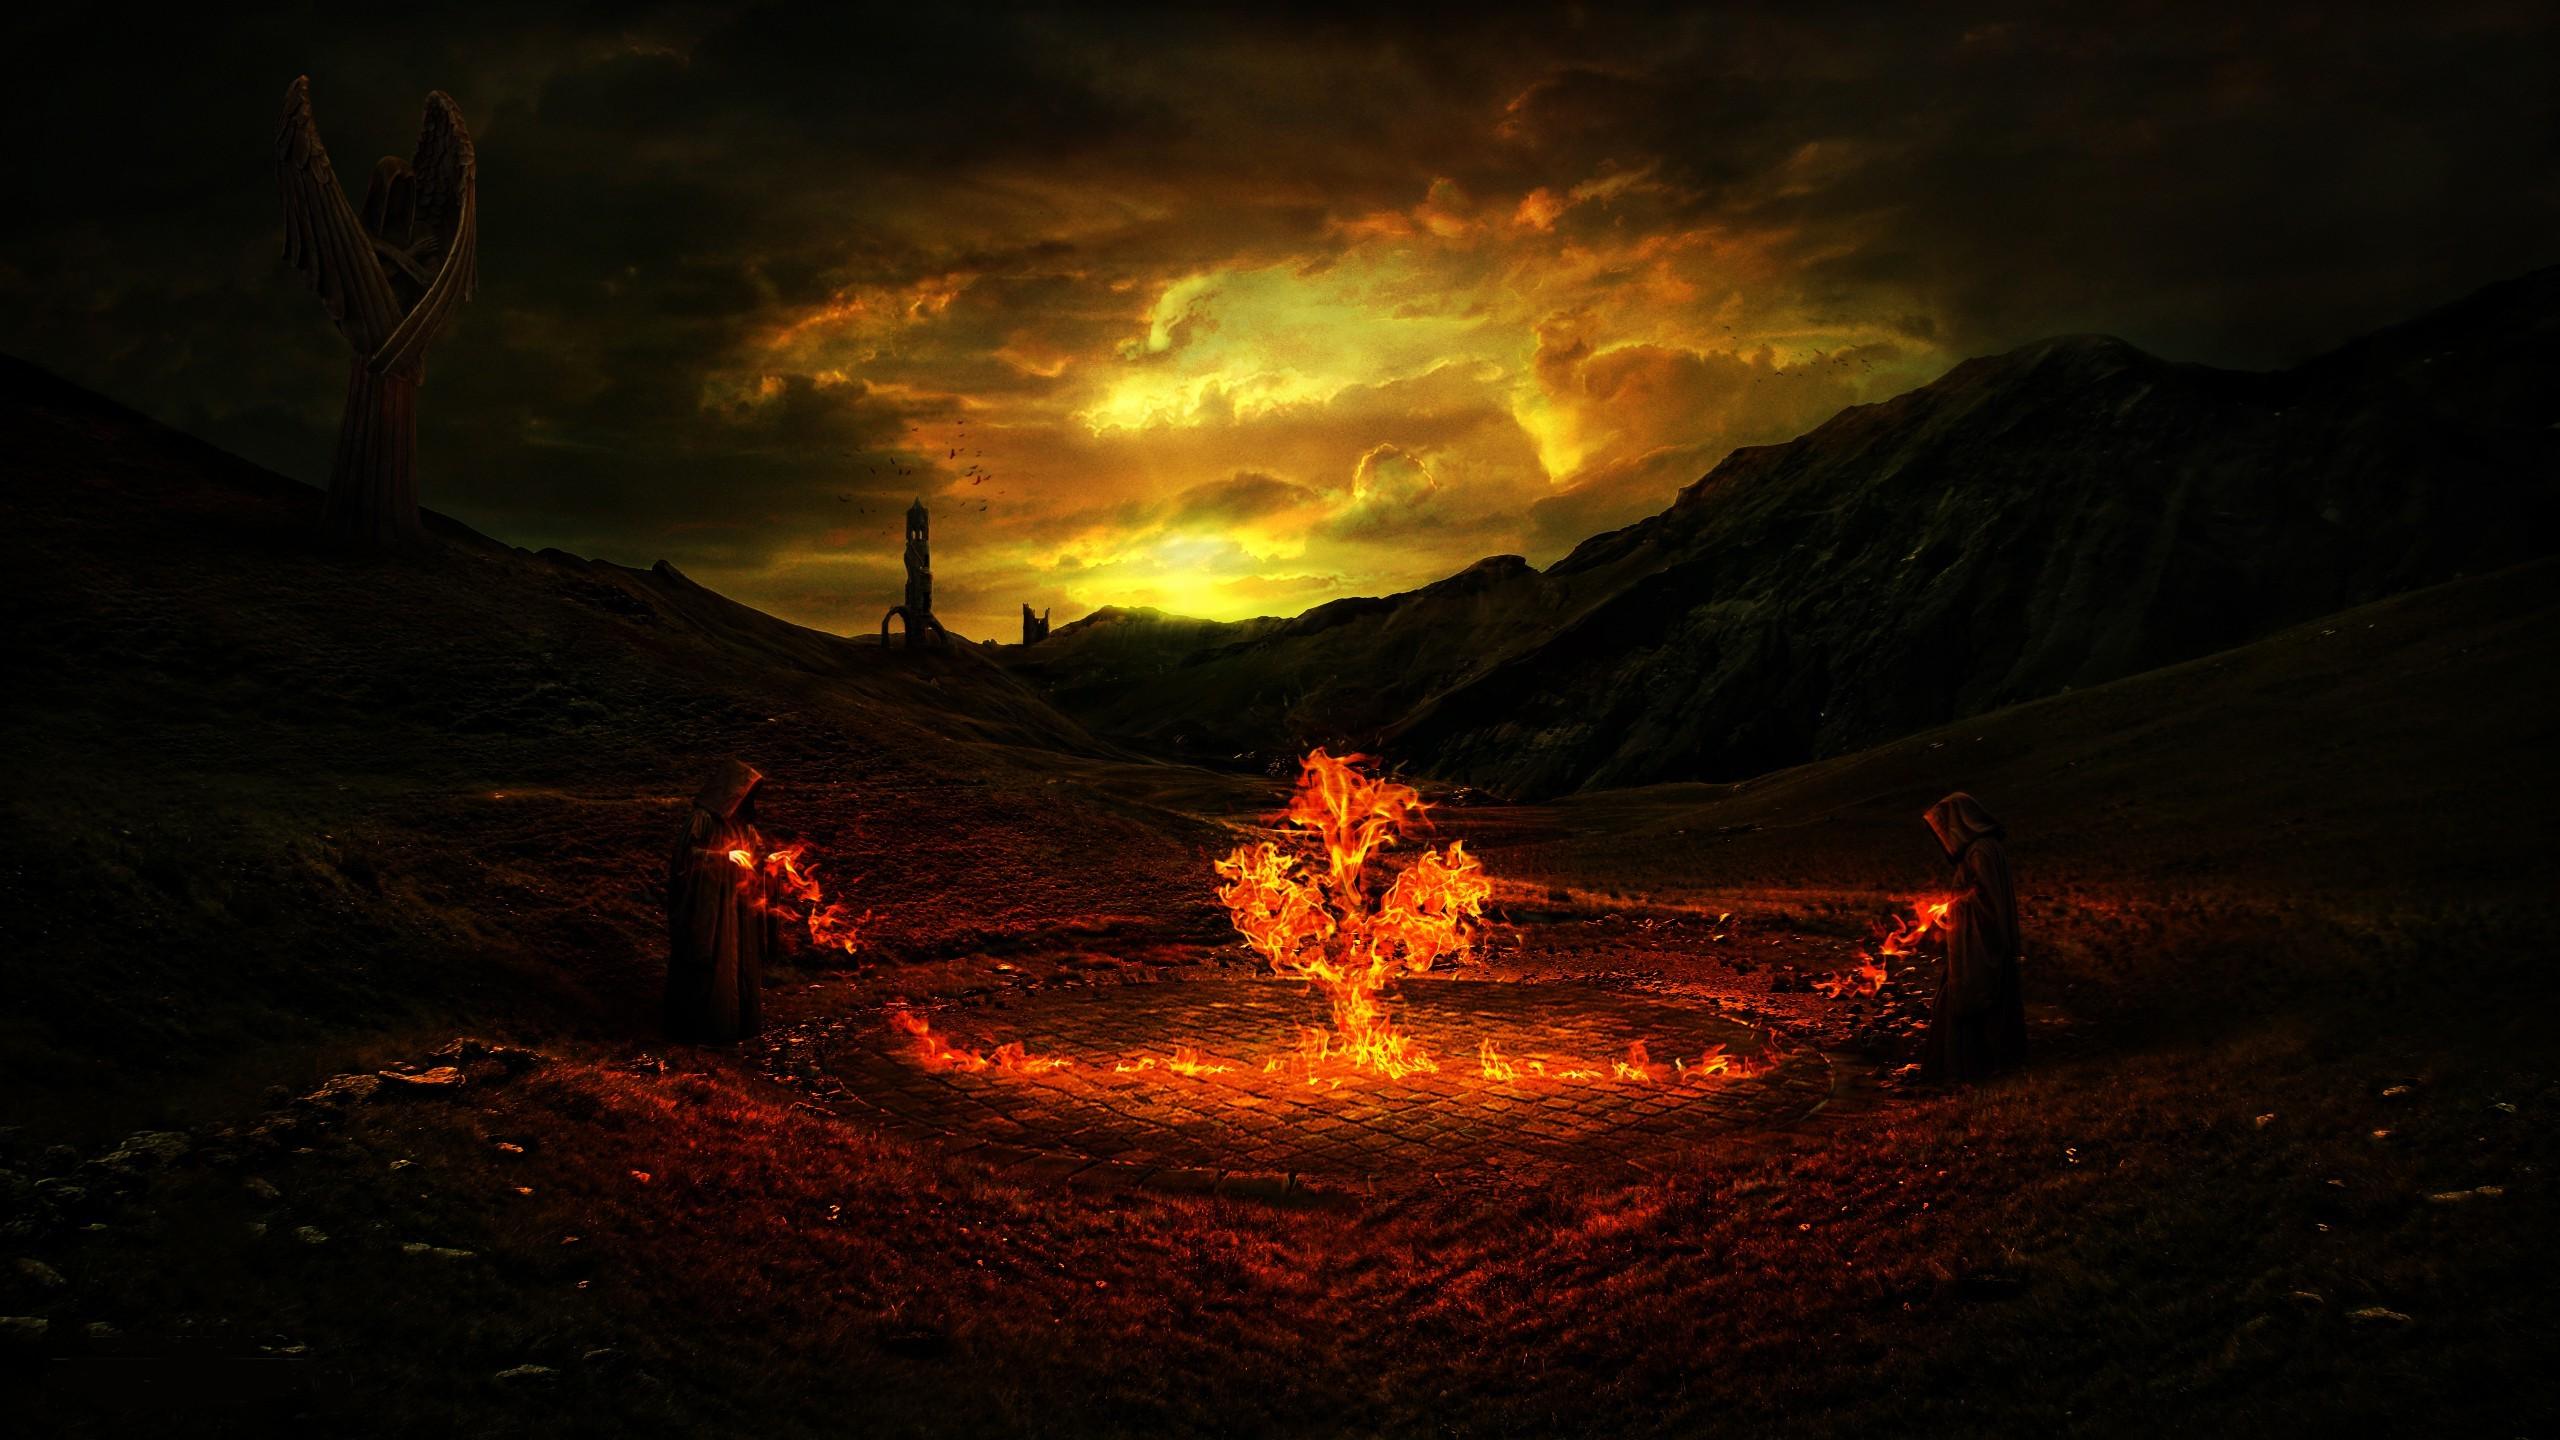 Amazing Wallpaper Night Evening - trees-fantasy-art-night-evening-fire-lava-darkness-screenshot-2560x1440-px-geological-phenomenon-604484  Trends-38774.jpg